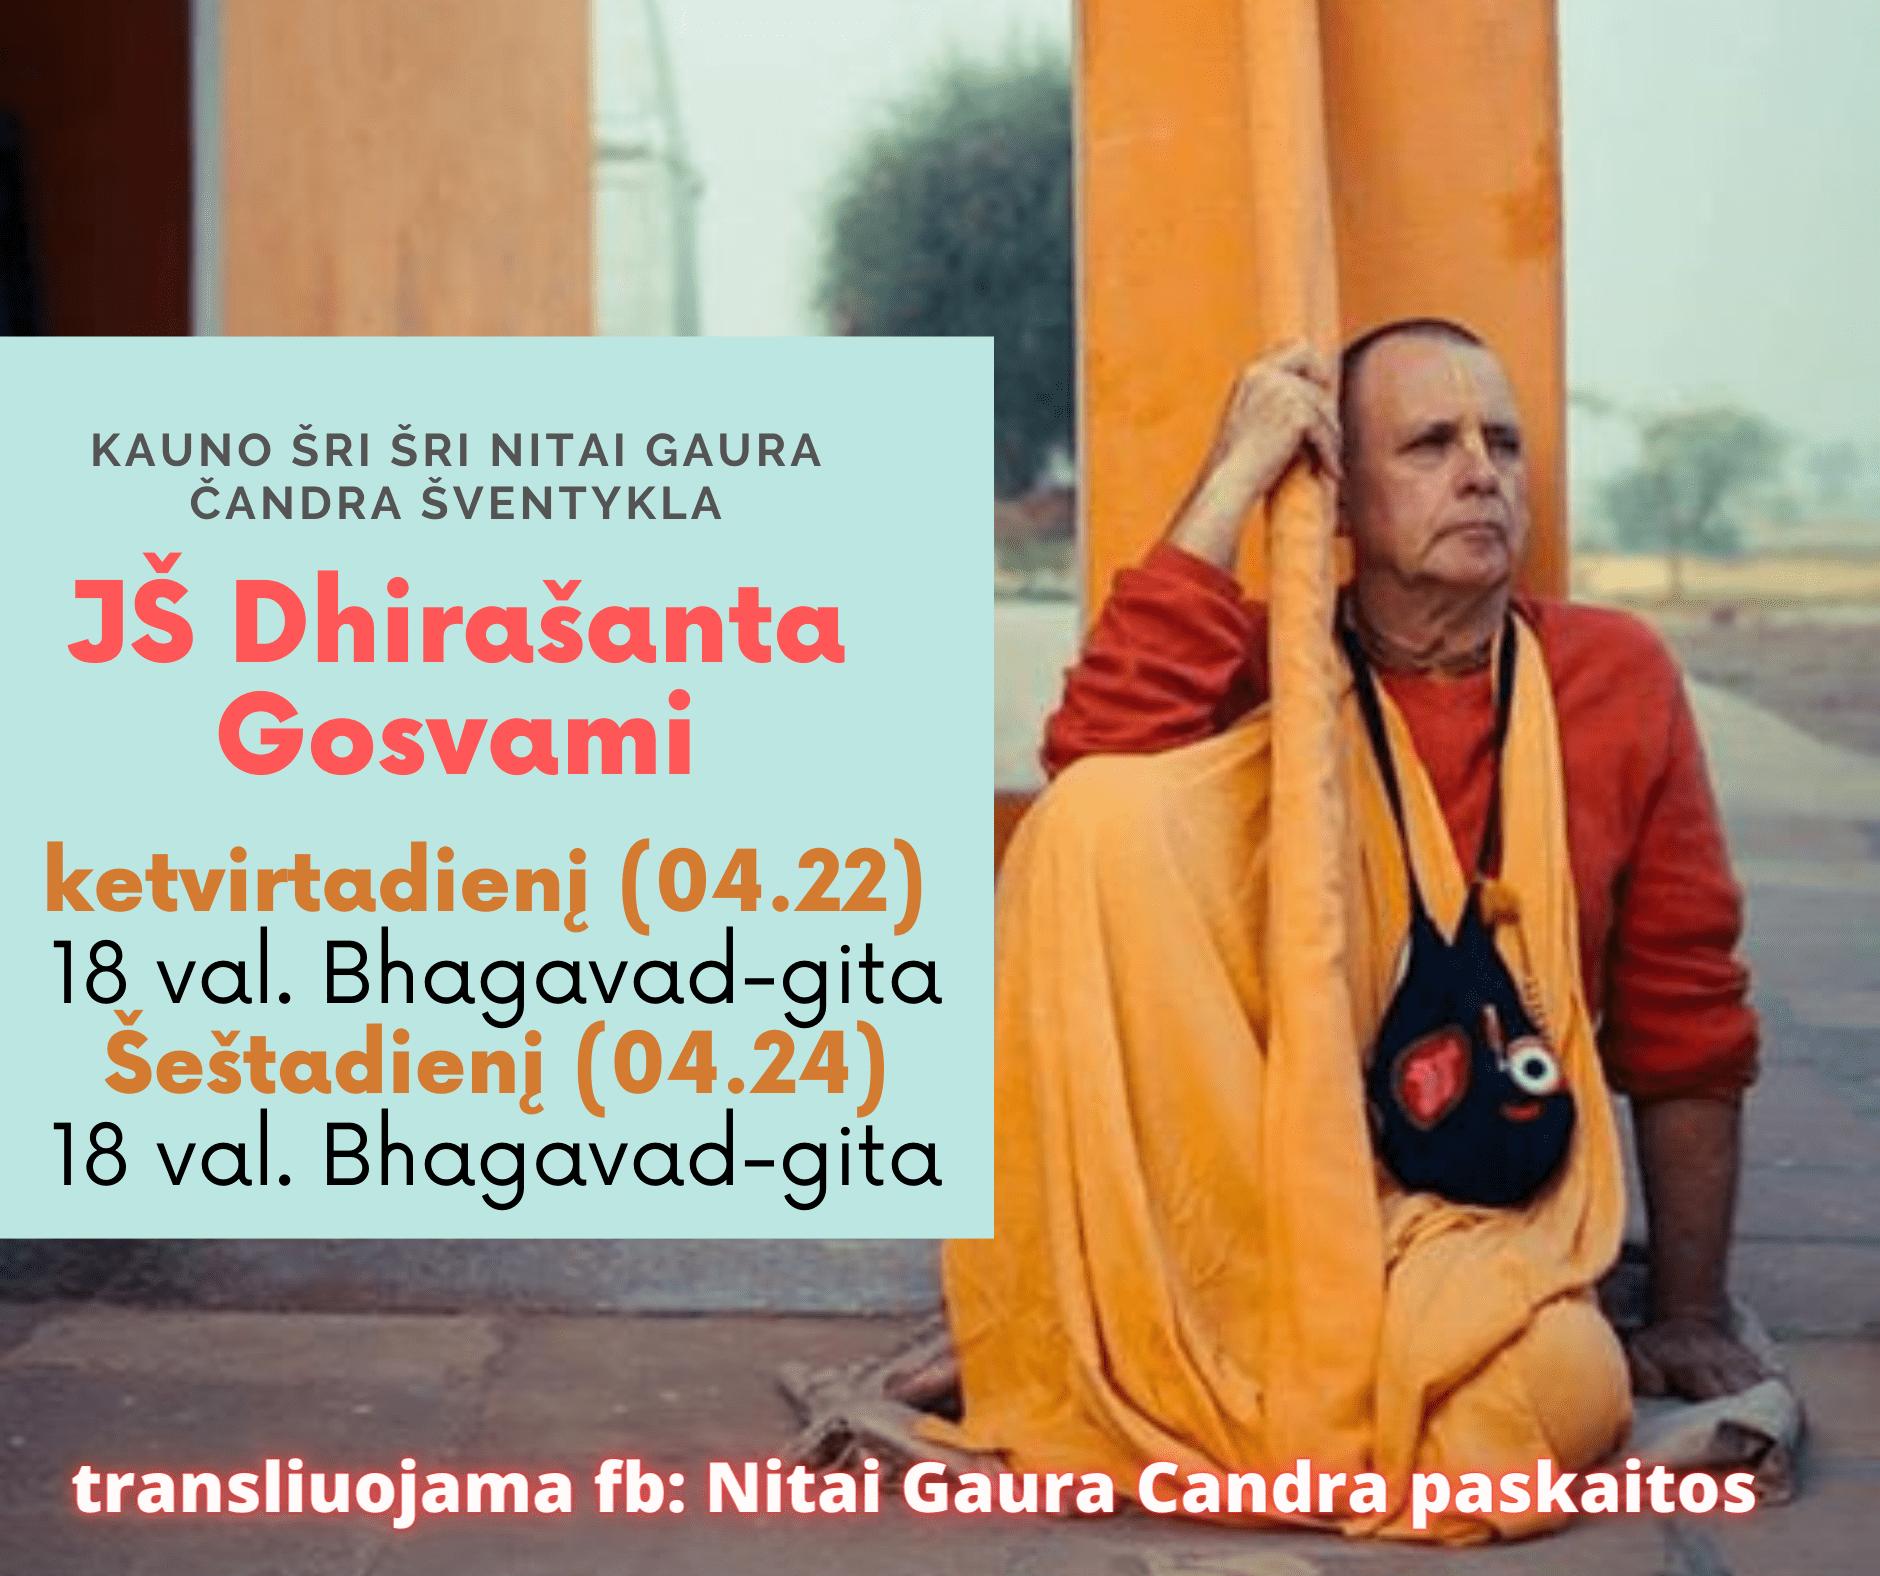 HH Dhirashanta das Goswami